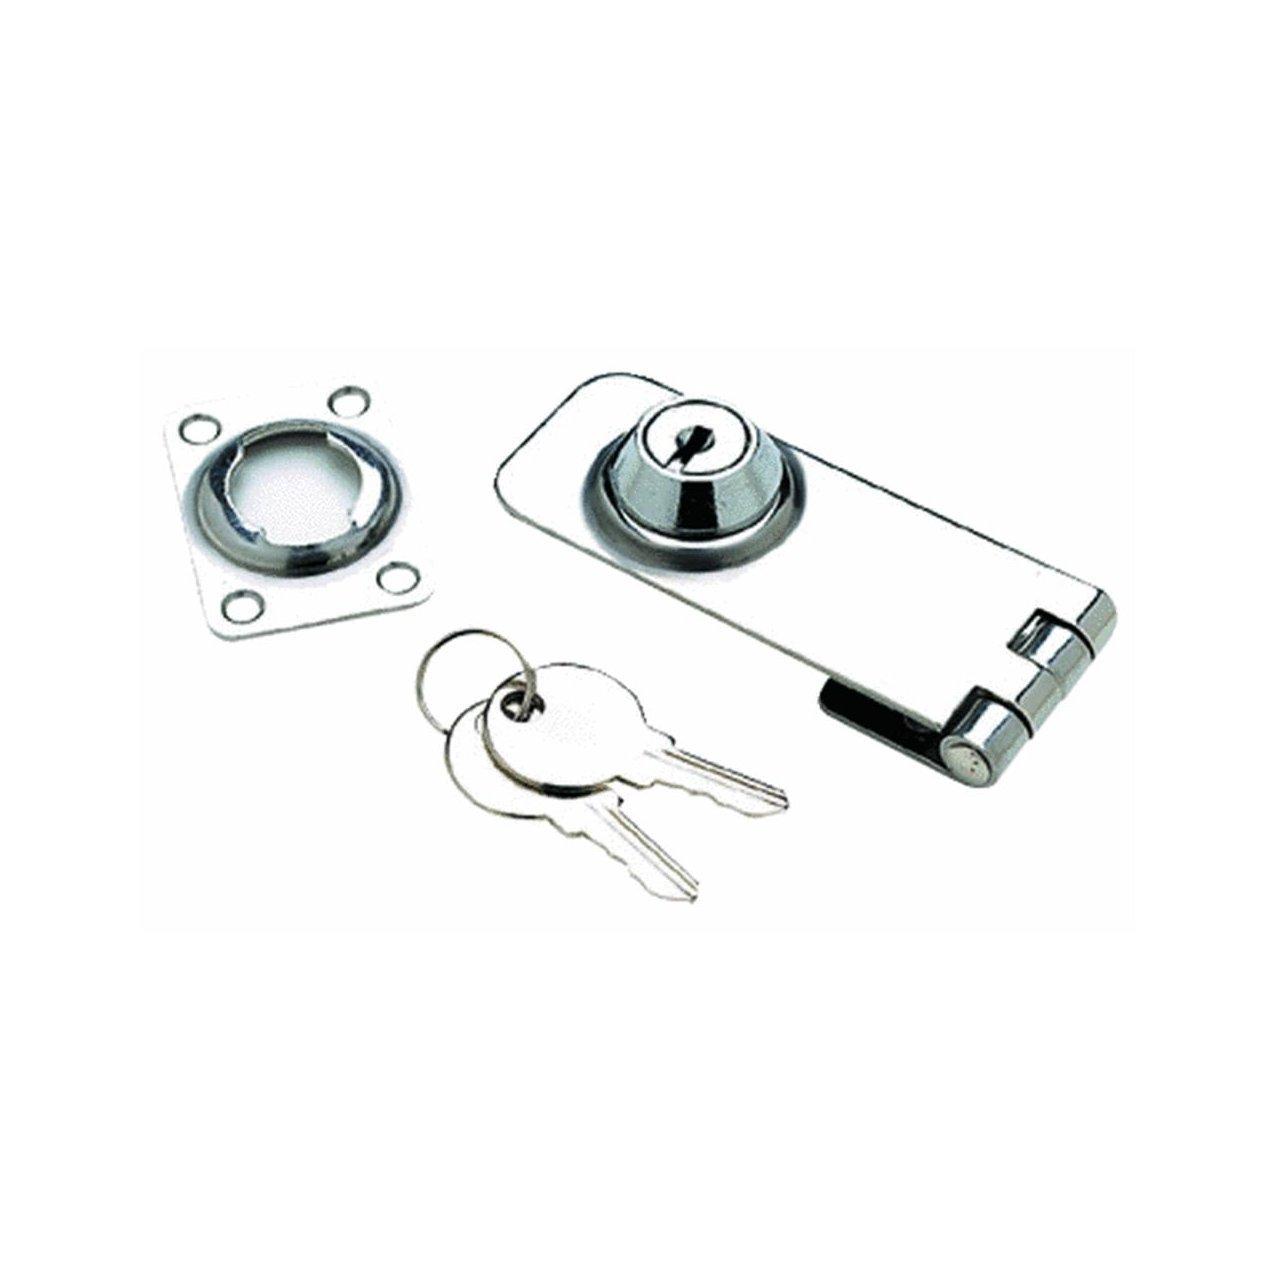 Seachoice Prod 37031 1 1 8X3 Ss Lockable Hasp